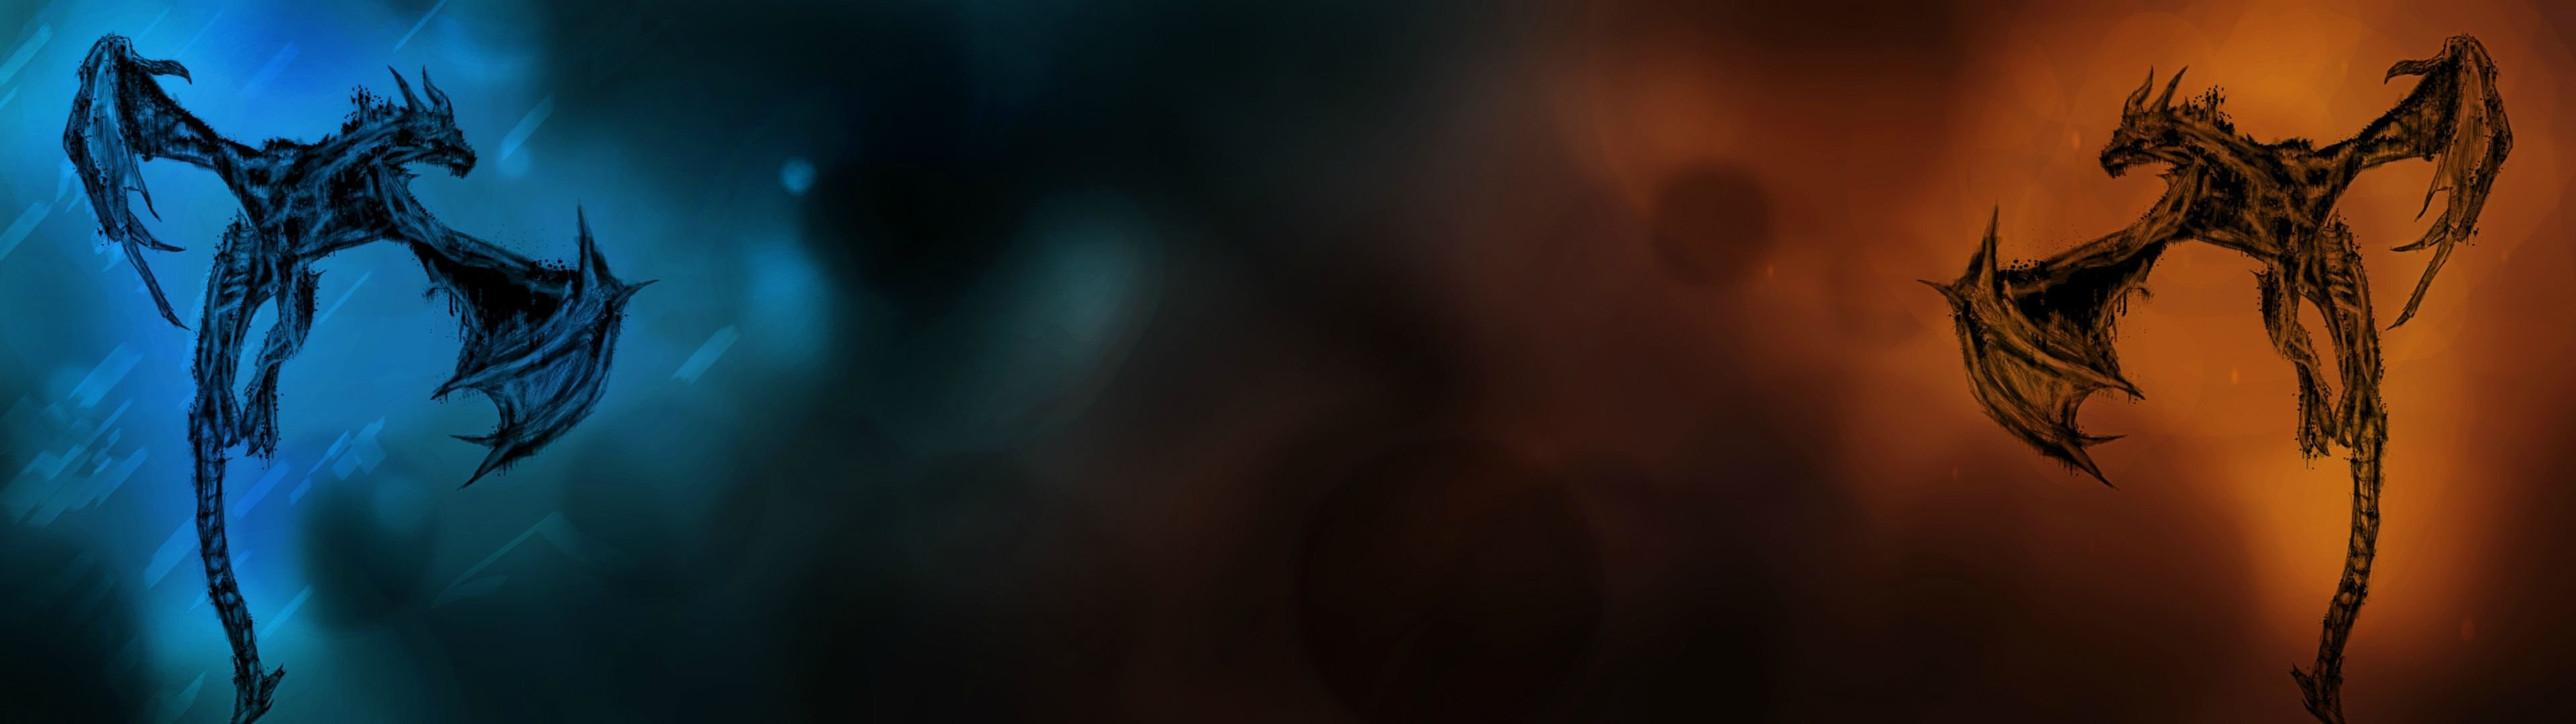 dual monitor wallpaper images (20)